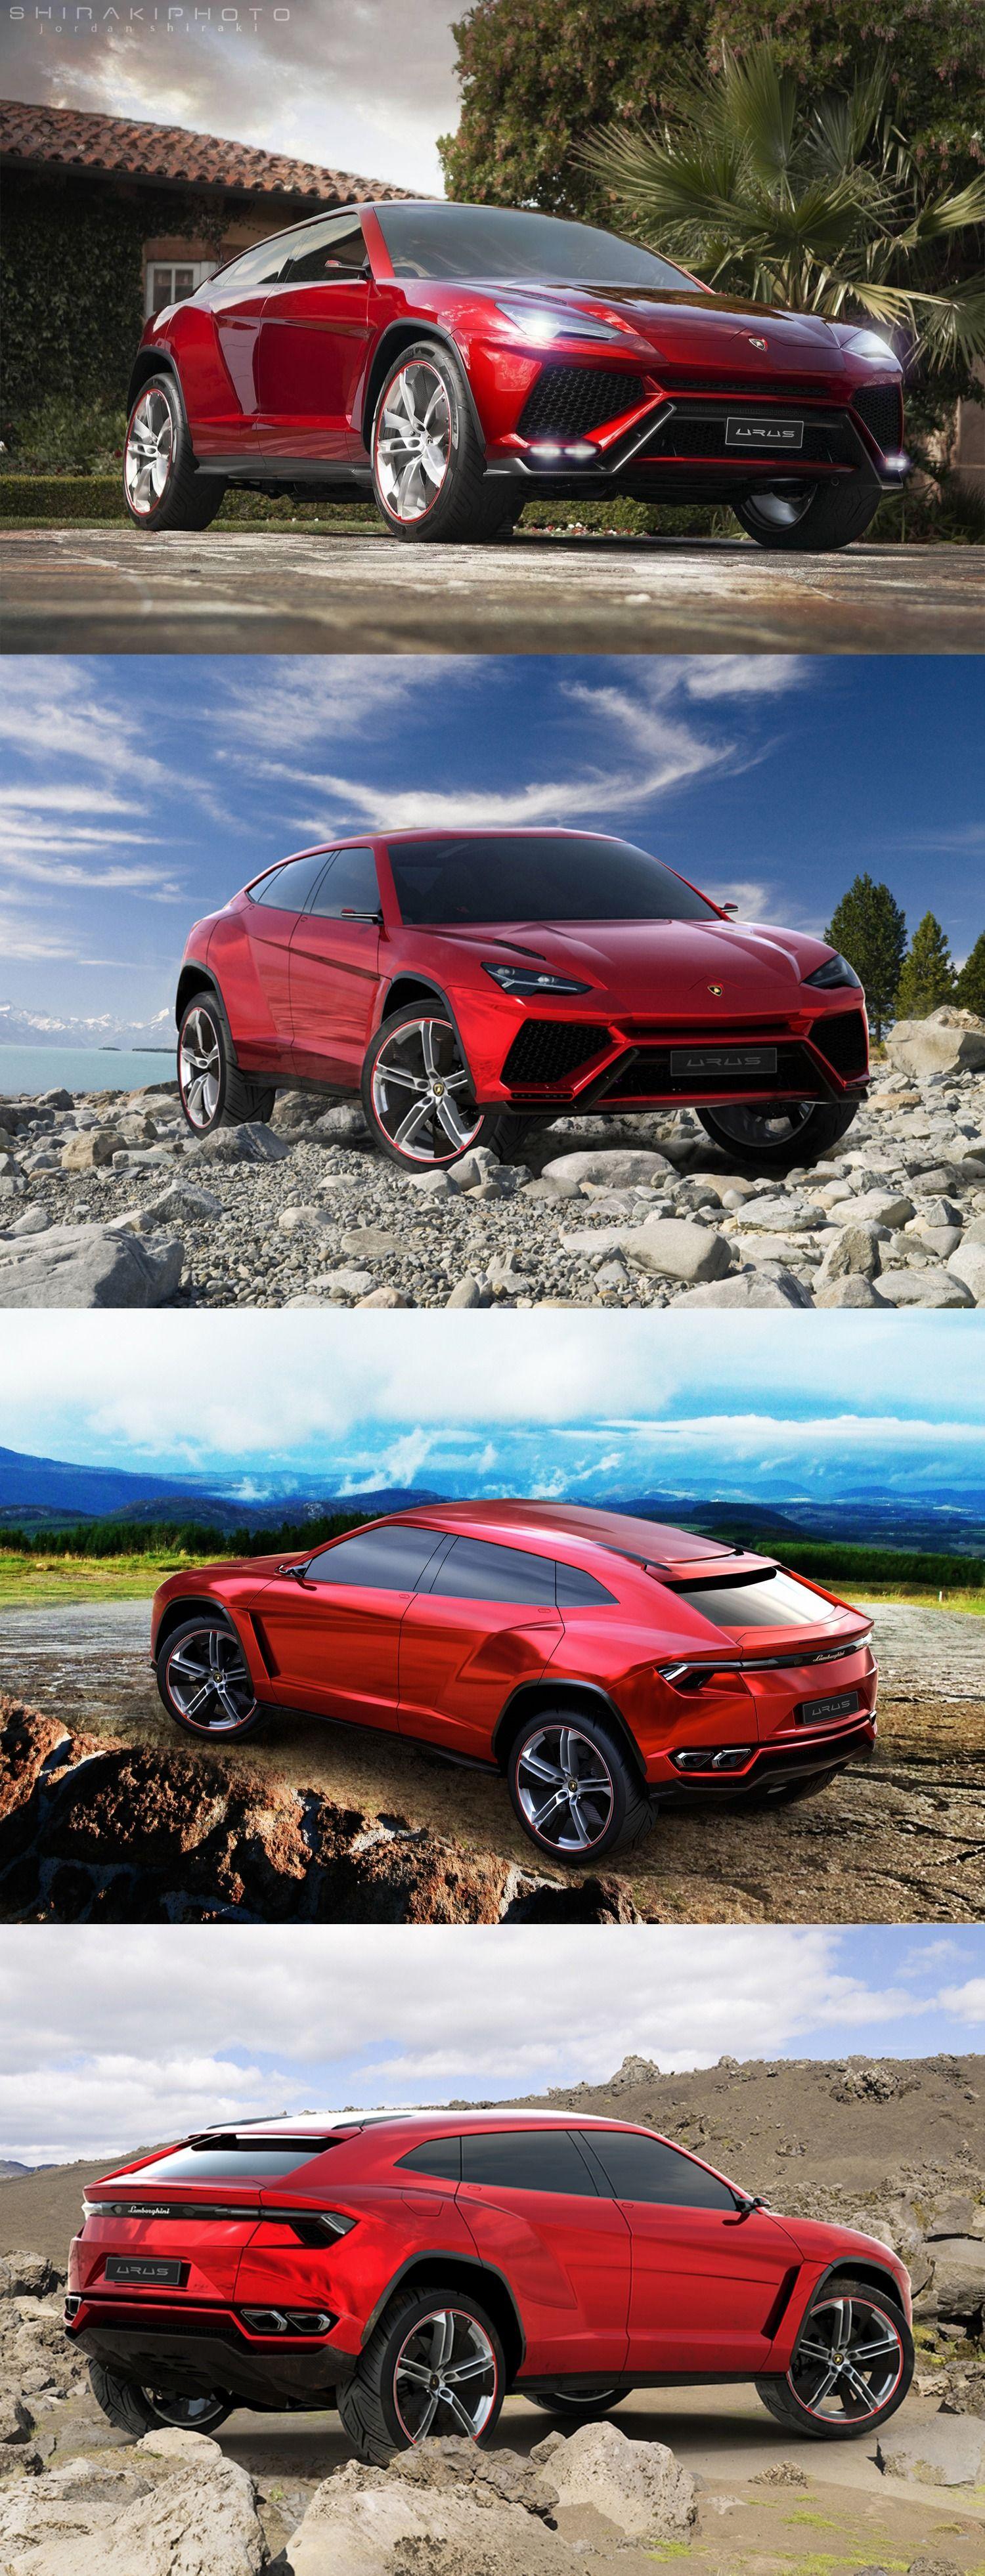 Lamborghini Urus SUV to Receive Plug-in Hybrid Powertrain